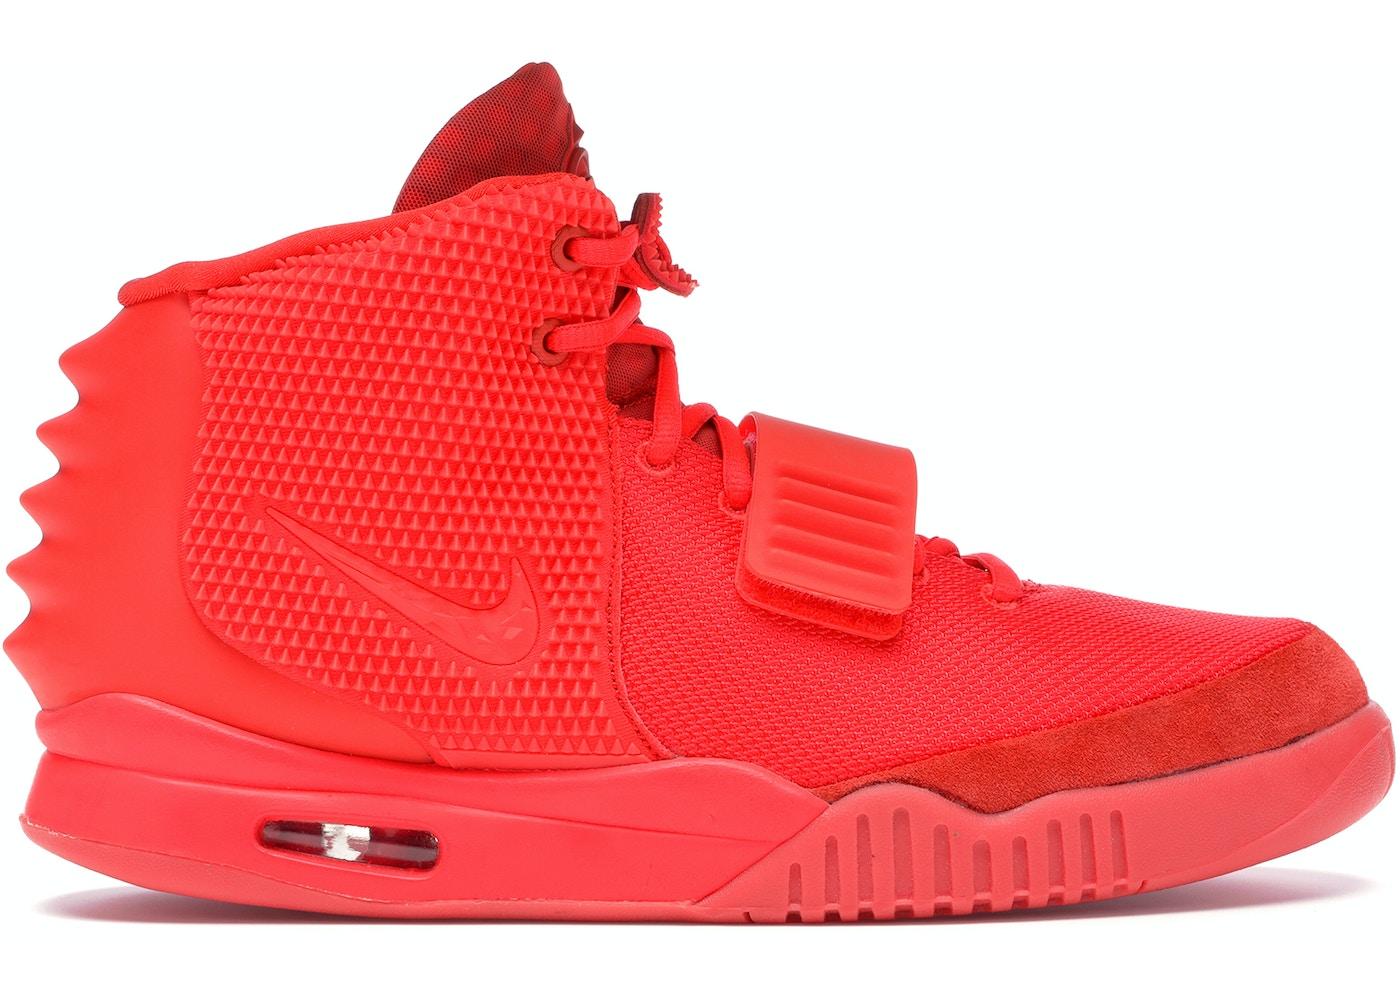 Paloma claramente Especializarse  Nike Air Yeezy 2 Red October - 508214-660